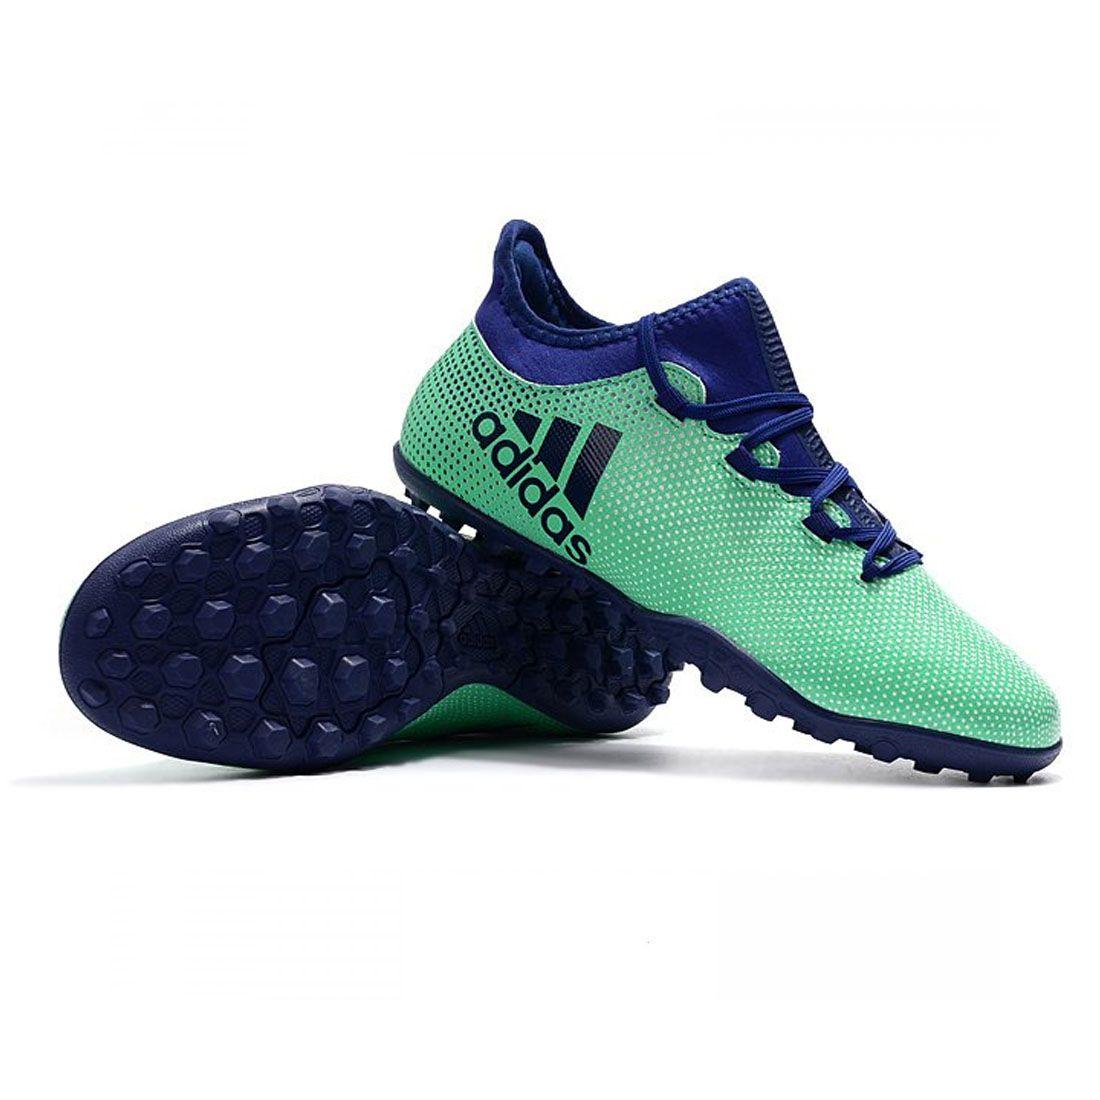 dd45bc4a56 Chuteira Adidas X Tango 17.3 TF Society Green N°41